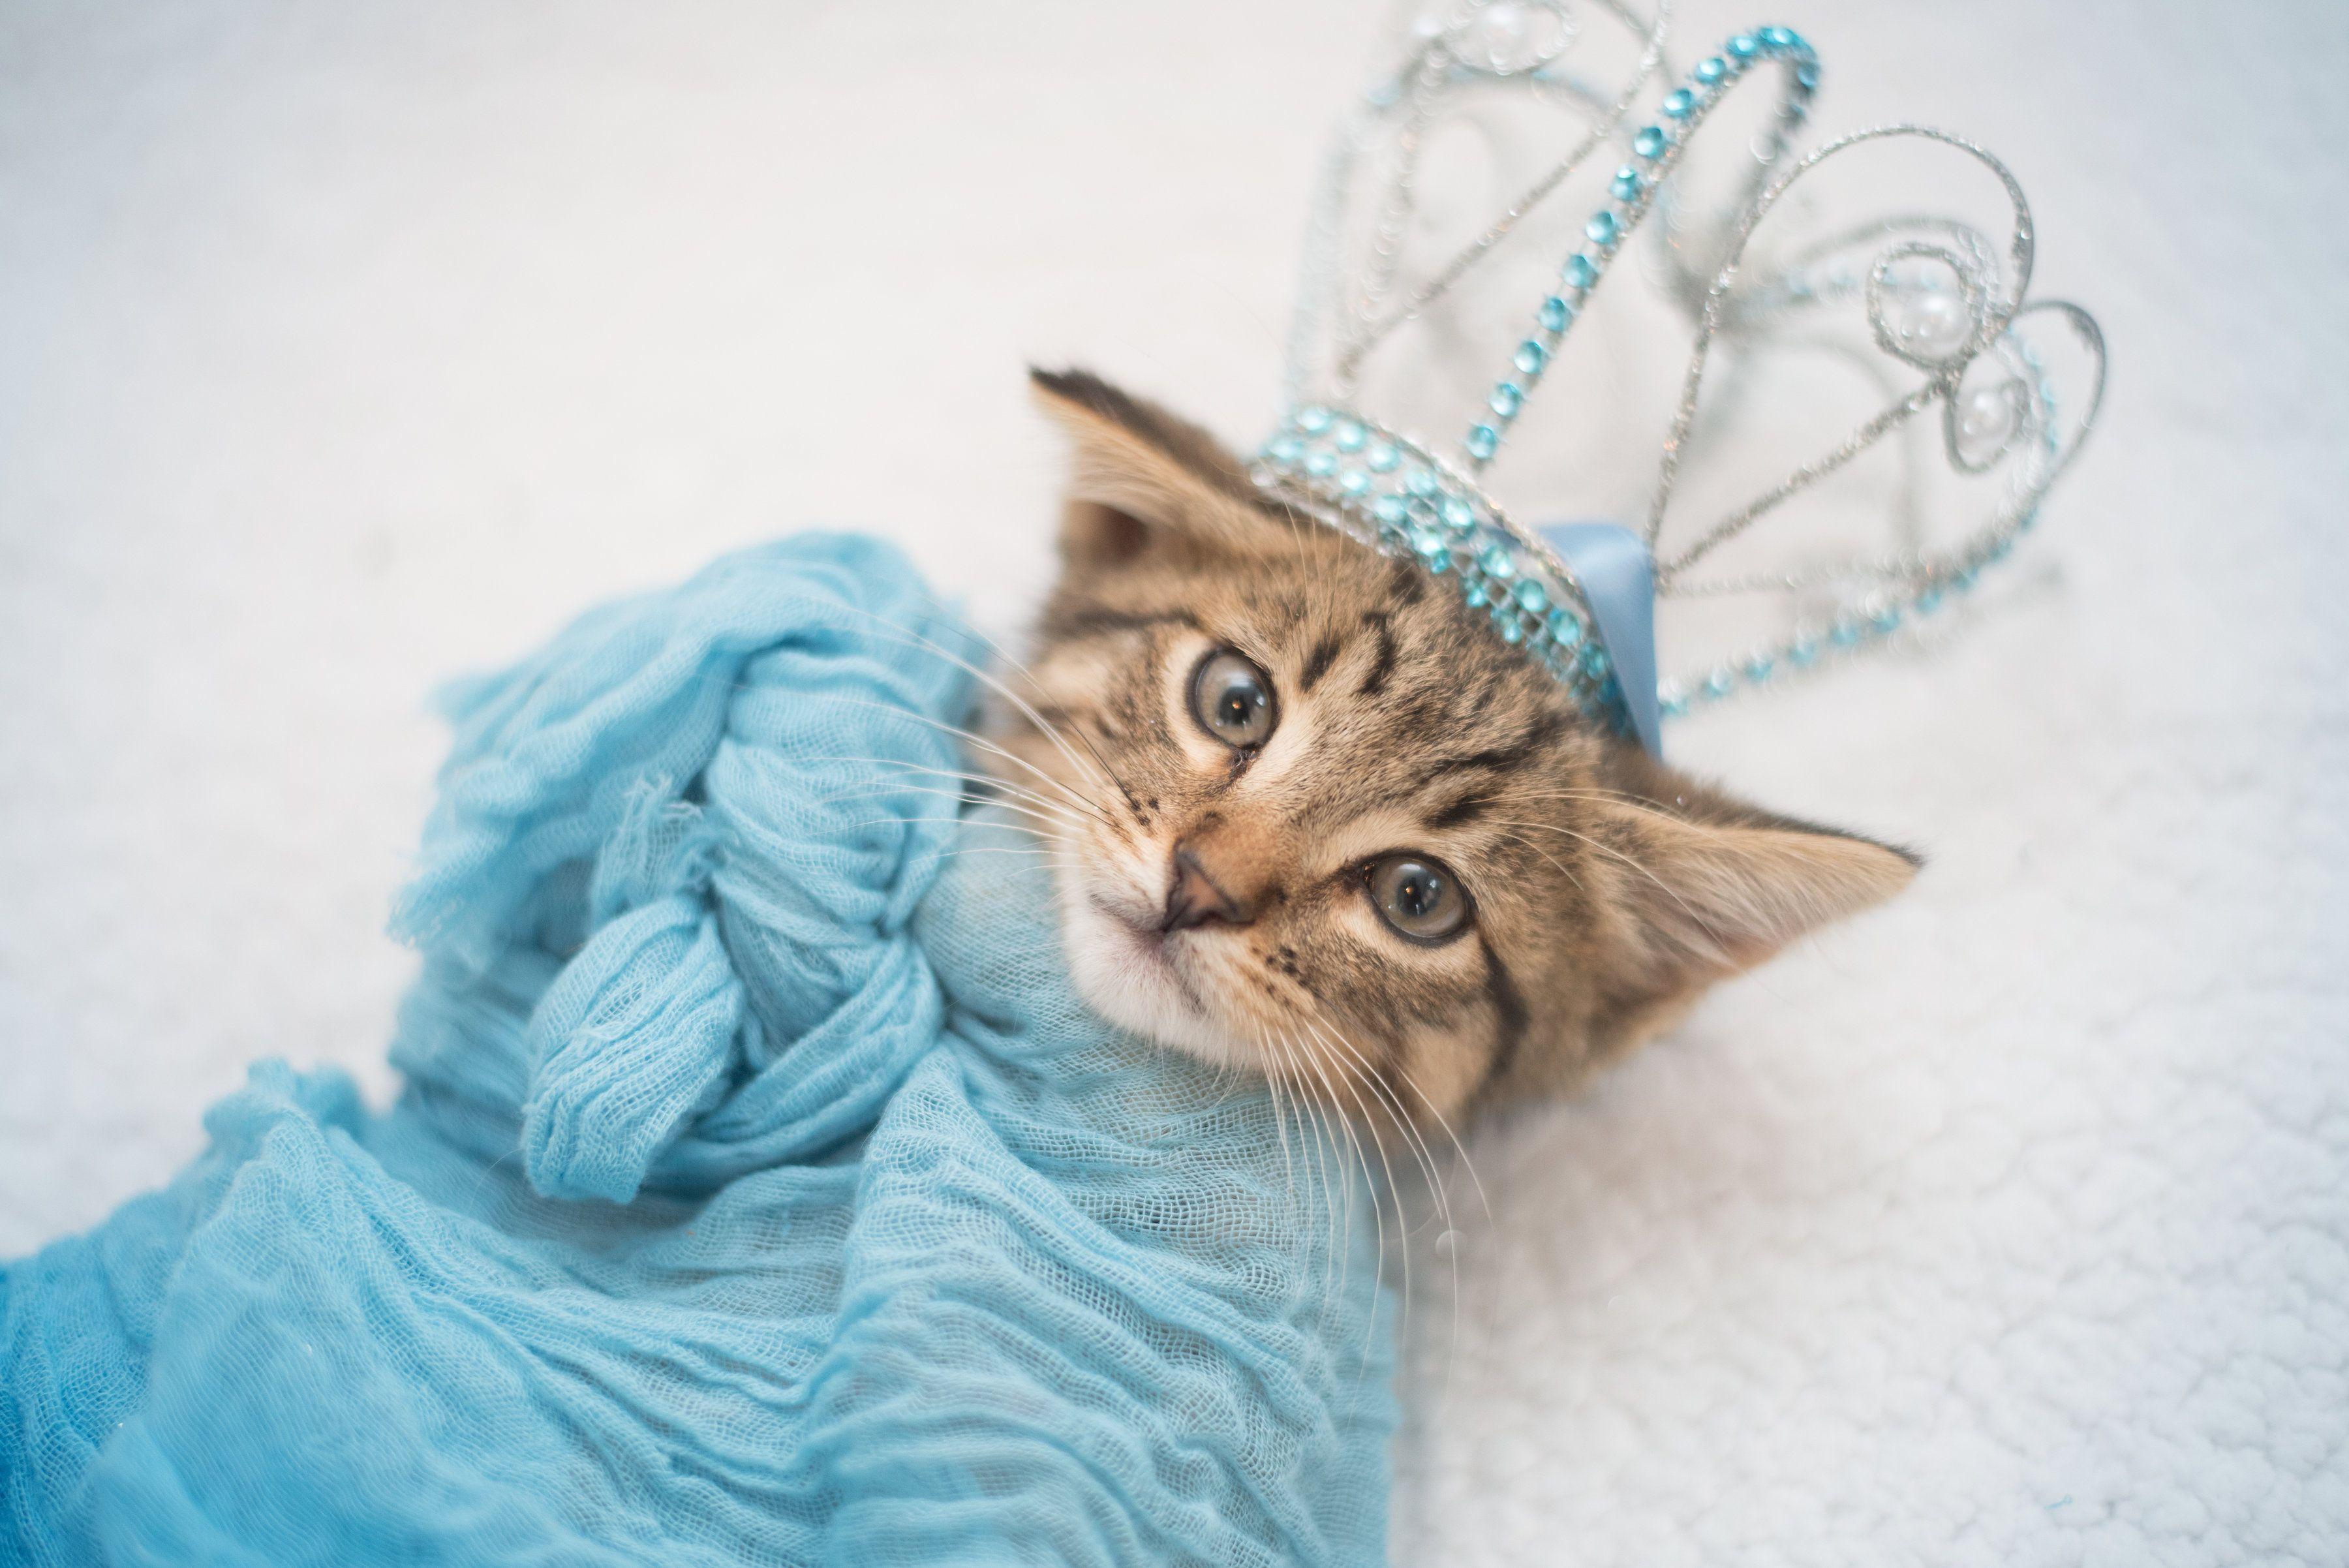 Family Stages Newborn Style Shoot For Their Kitten Newborn Kittens Cute Kawaii Animals Kitten